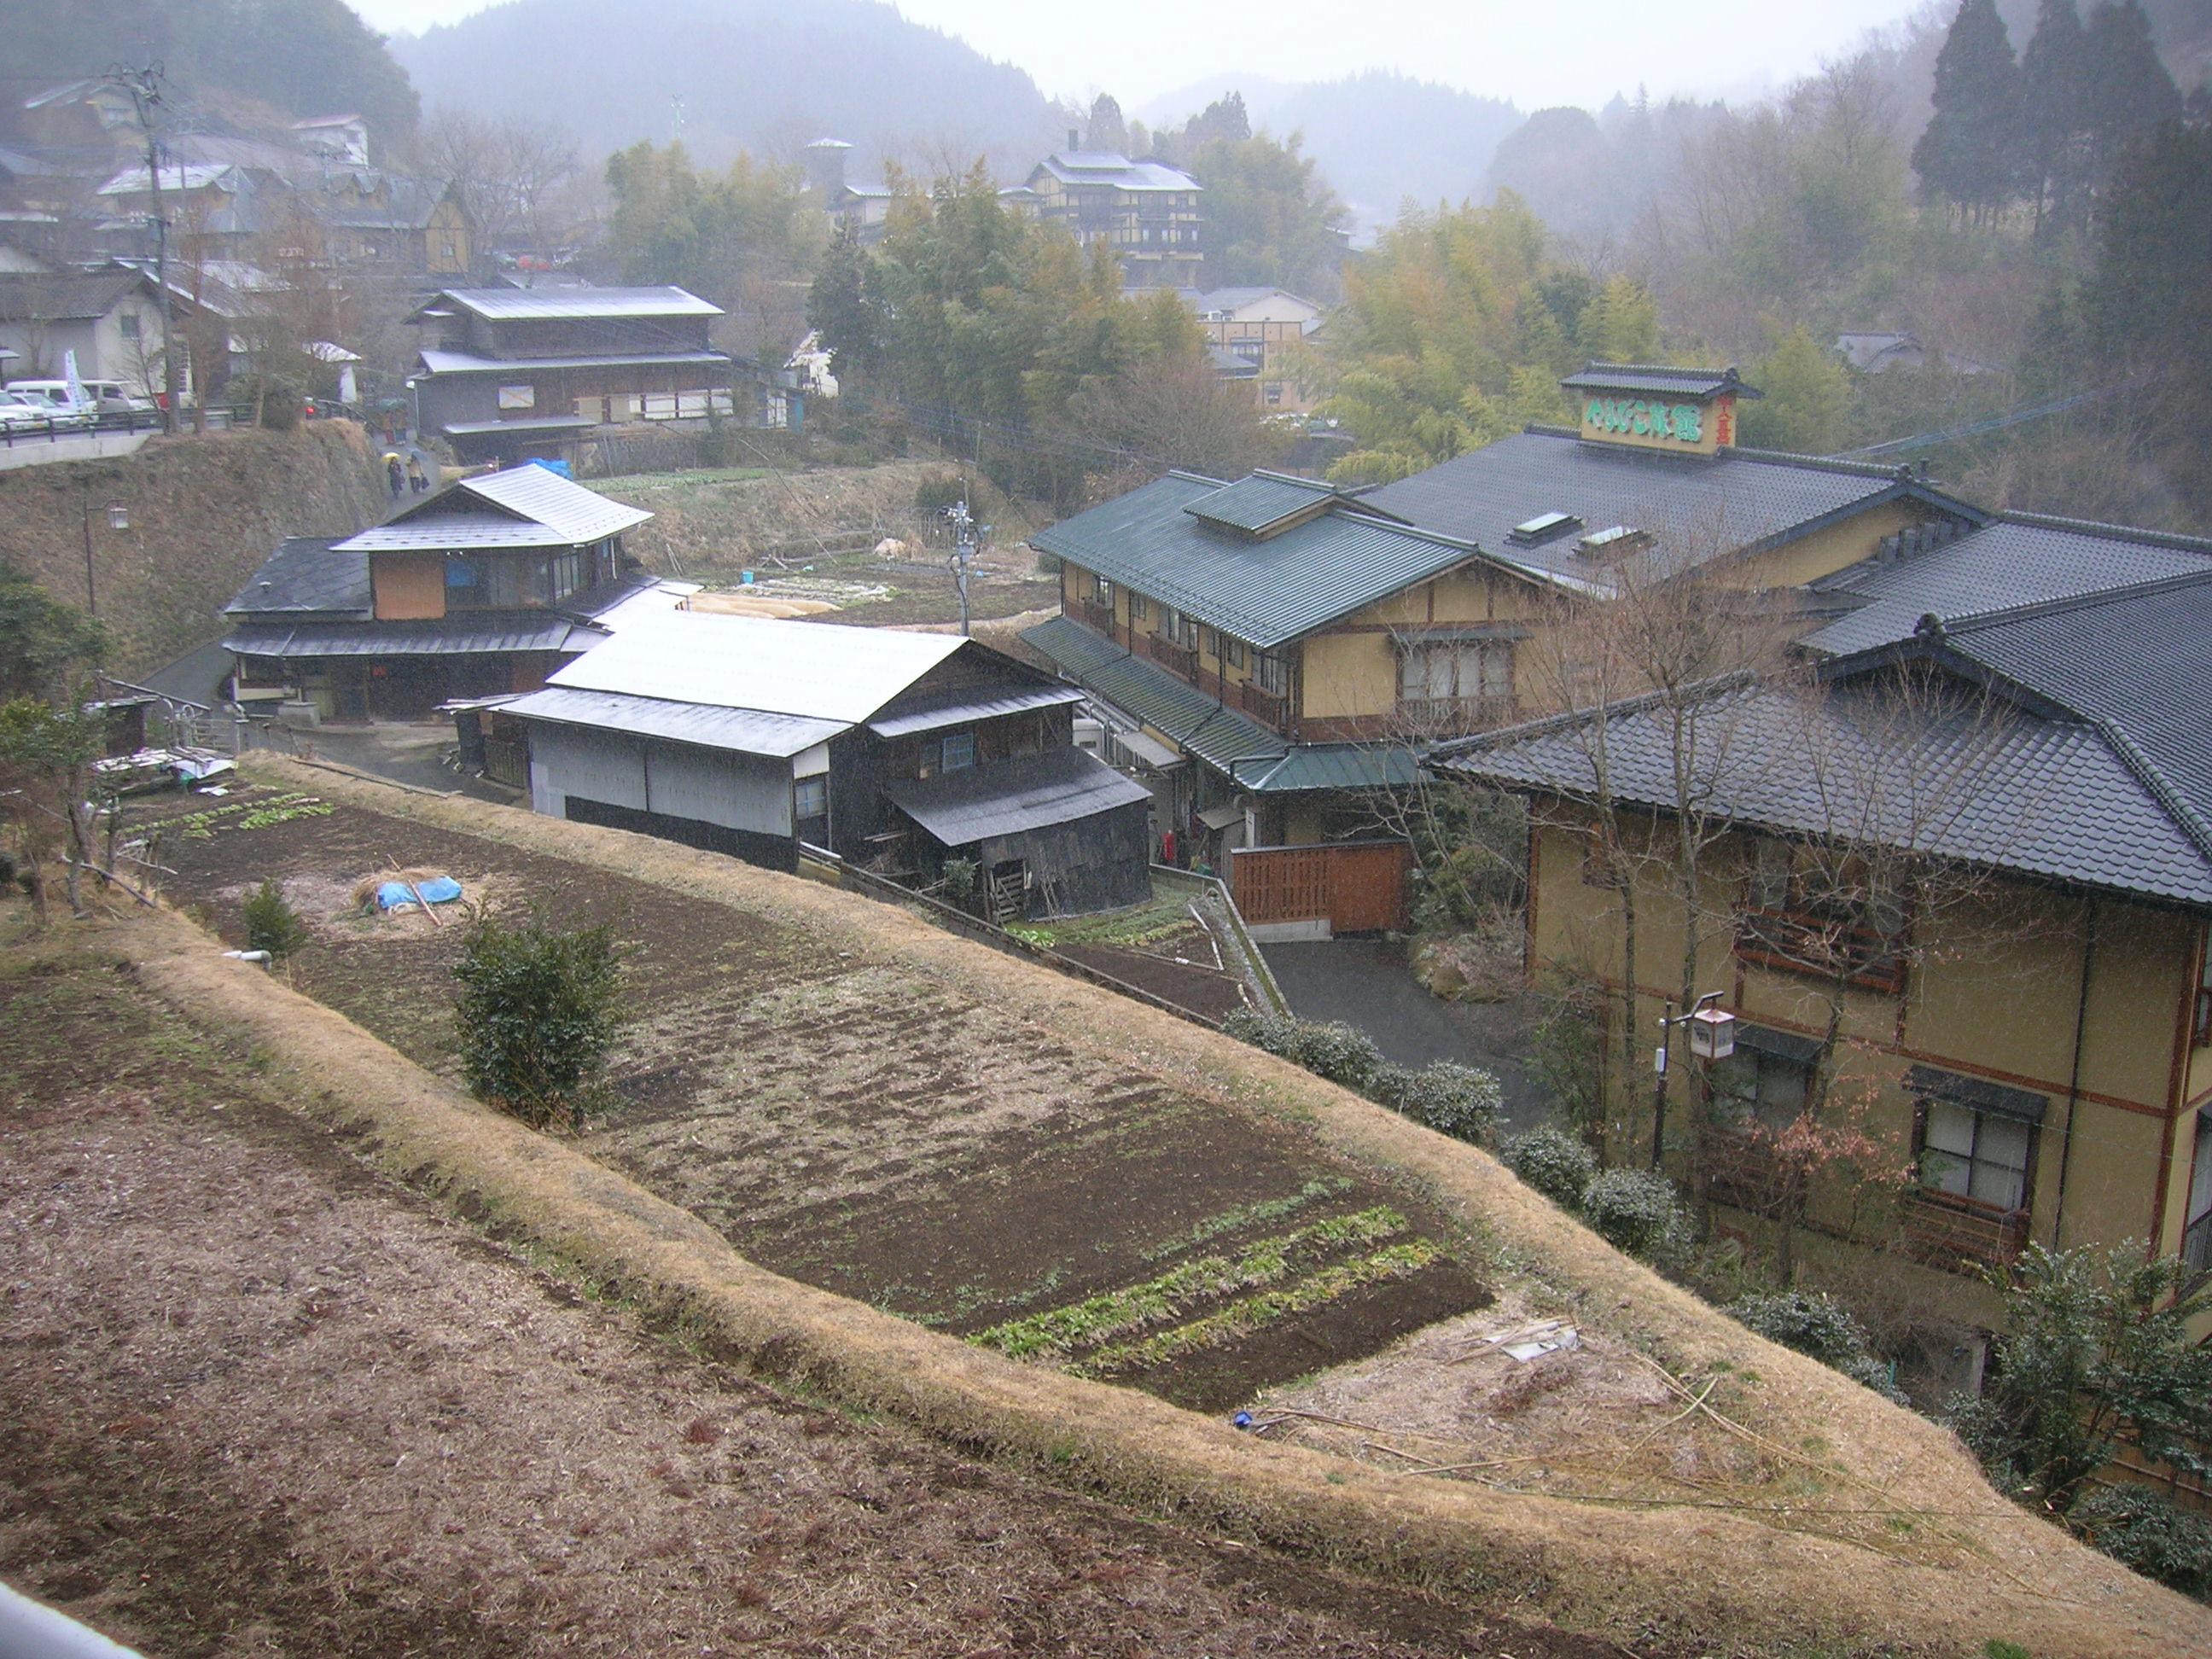 https://upload.wikimedia.org/wikipedia/commons/f/f8/Kurokawa_onsen_001.JPG